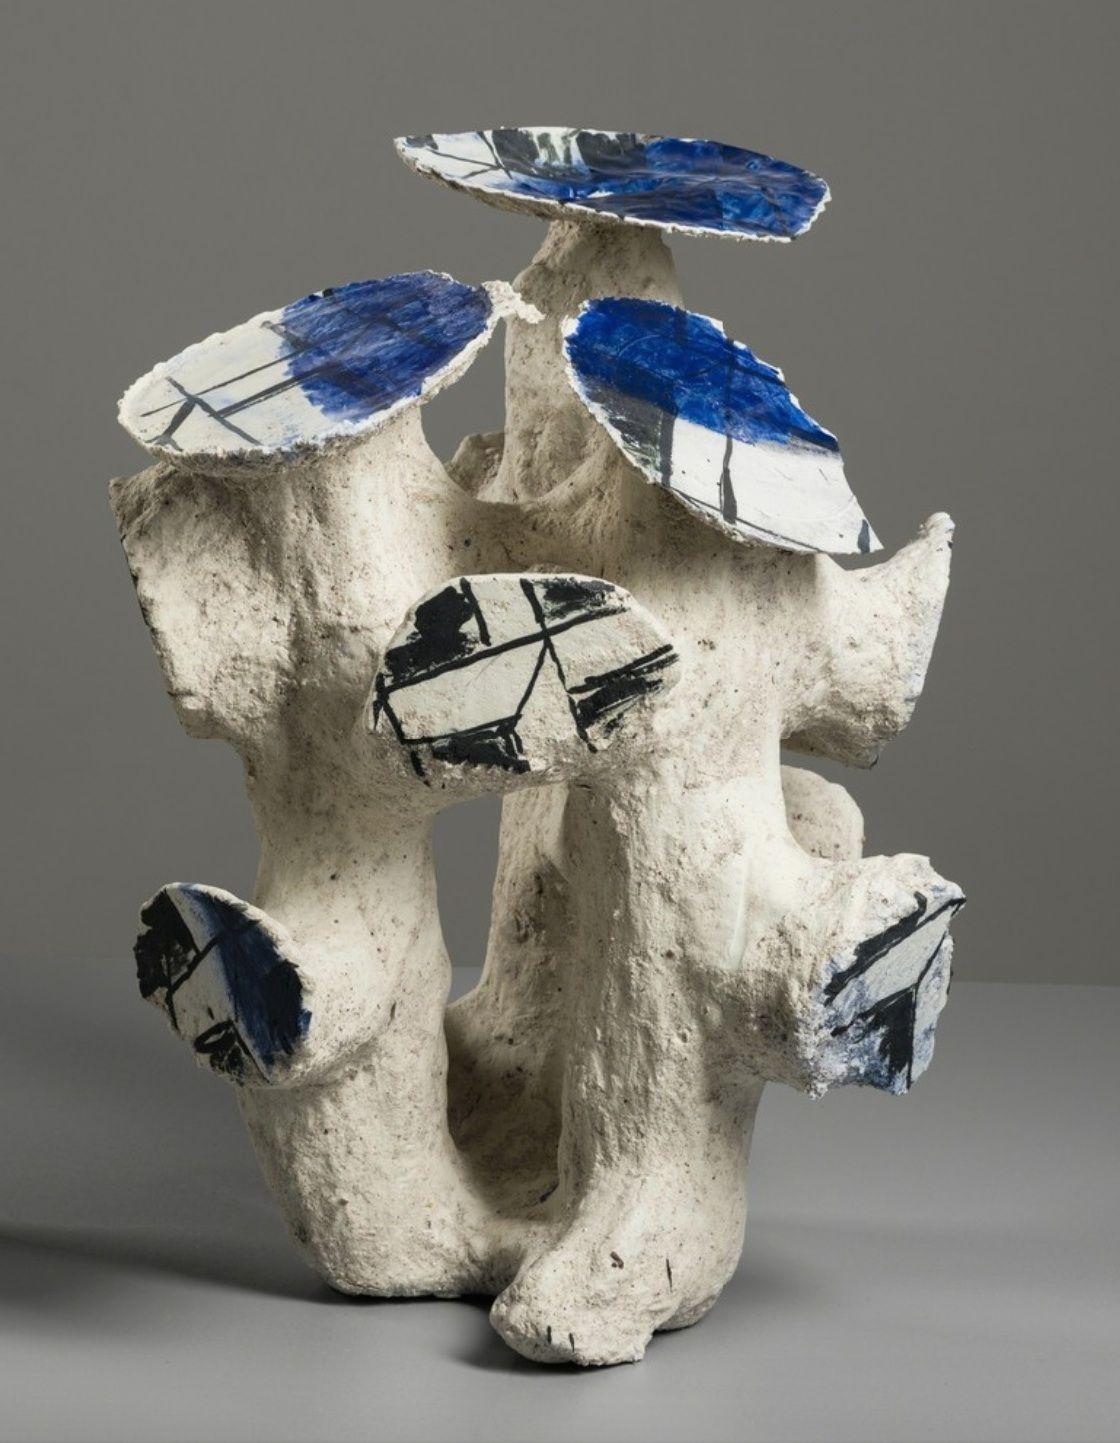 7-miami-basel-contemporary-ceramic-art-cfile - Johannes Nagel ...